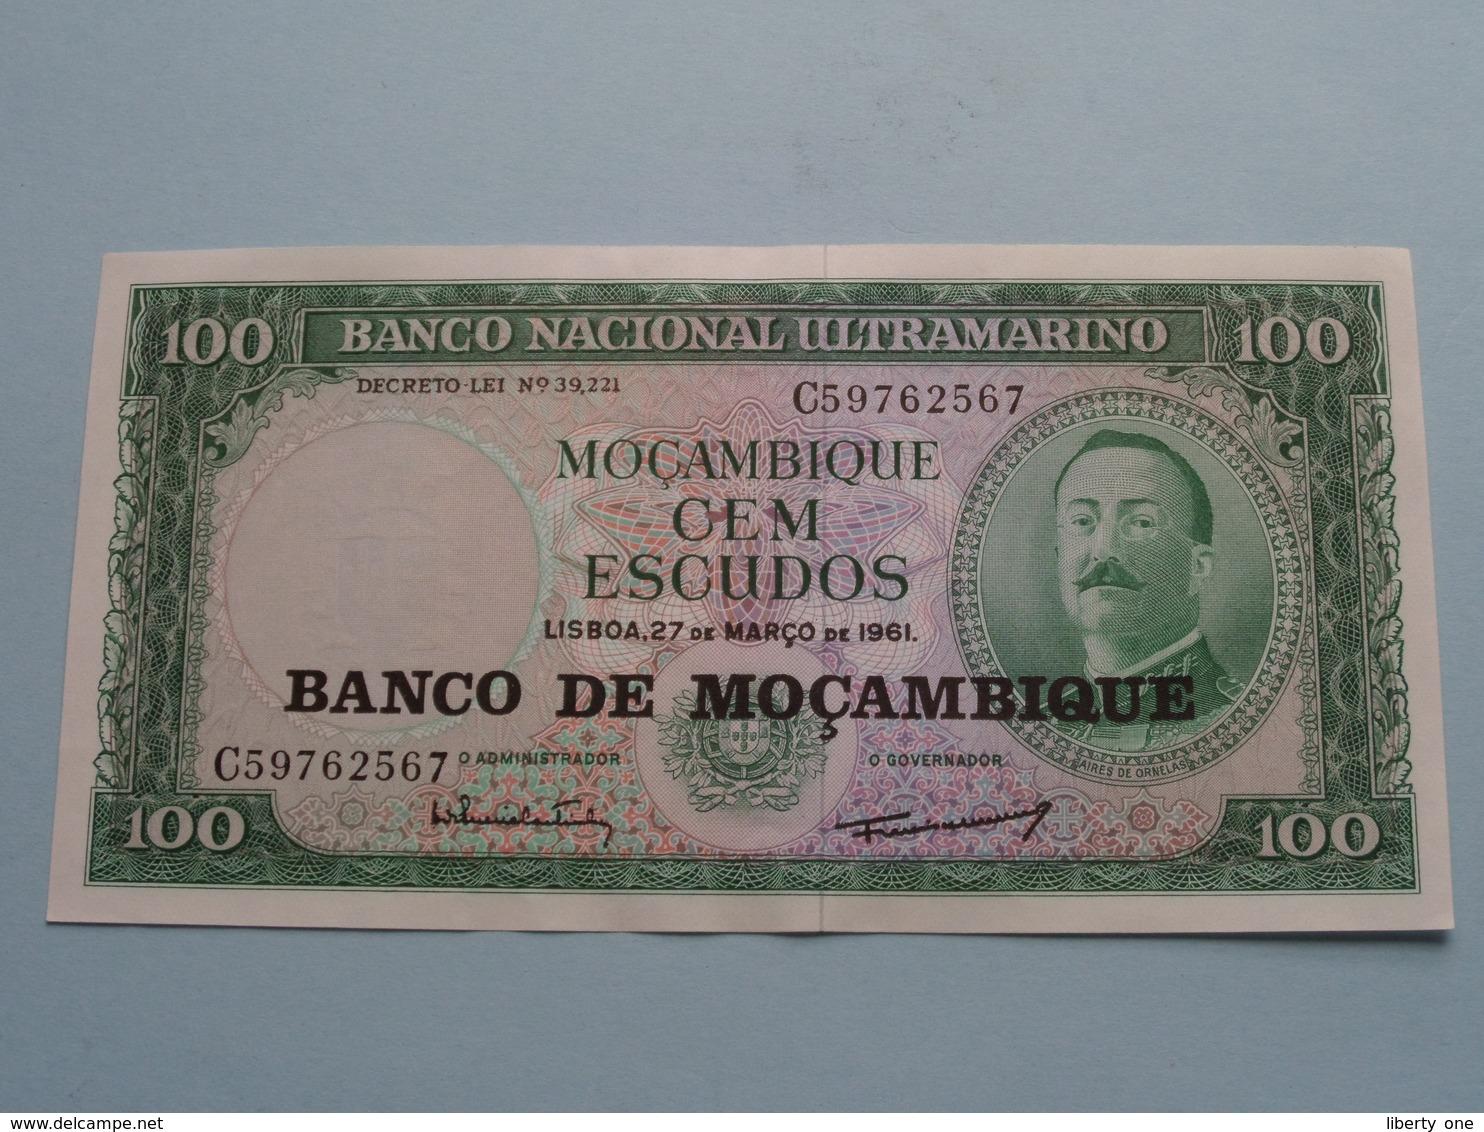 100 Cem ESCUDOS Lisboa De Mar 1961 ( C59762567 ) Banco De Moçambique ( For Grade, Please See Photo ) ! - Mozambique